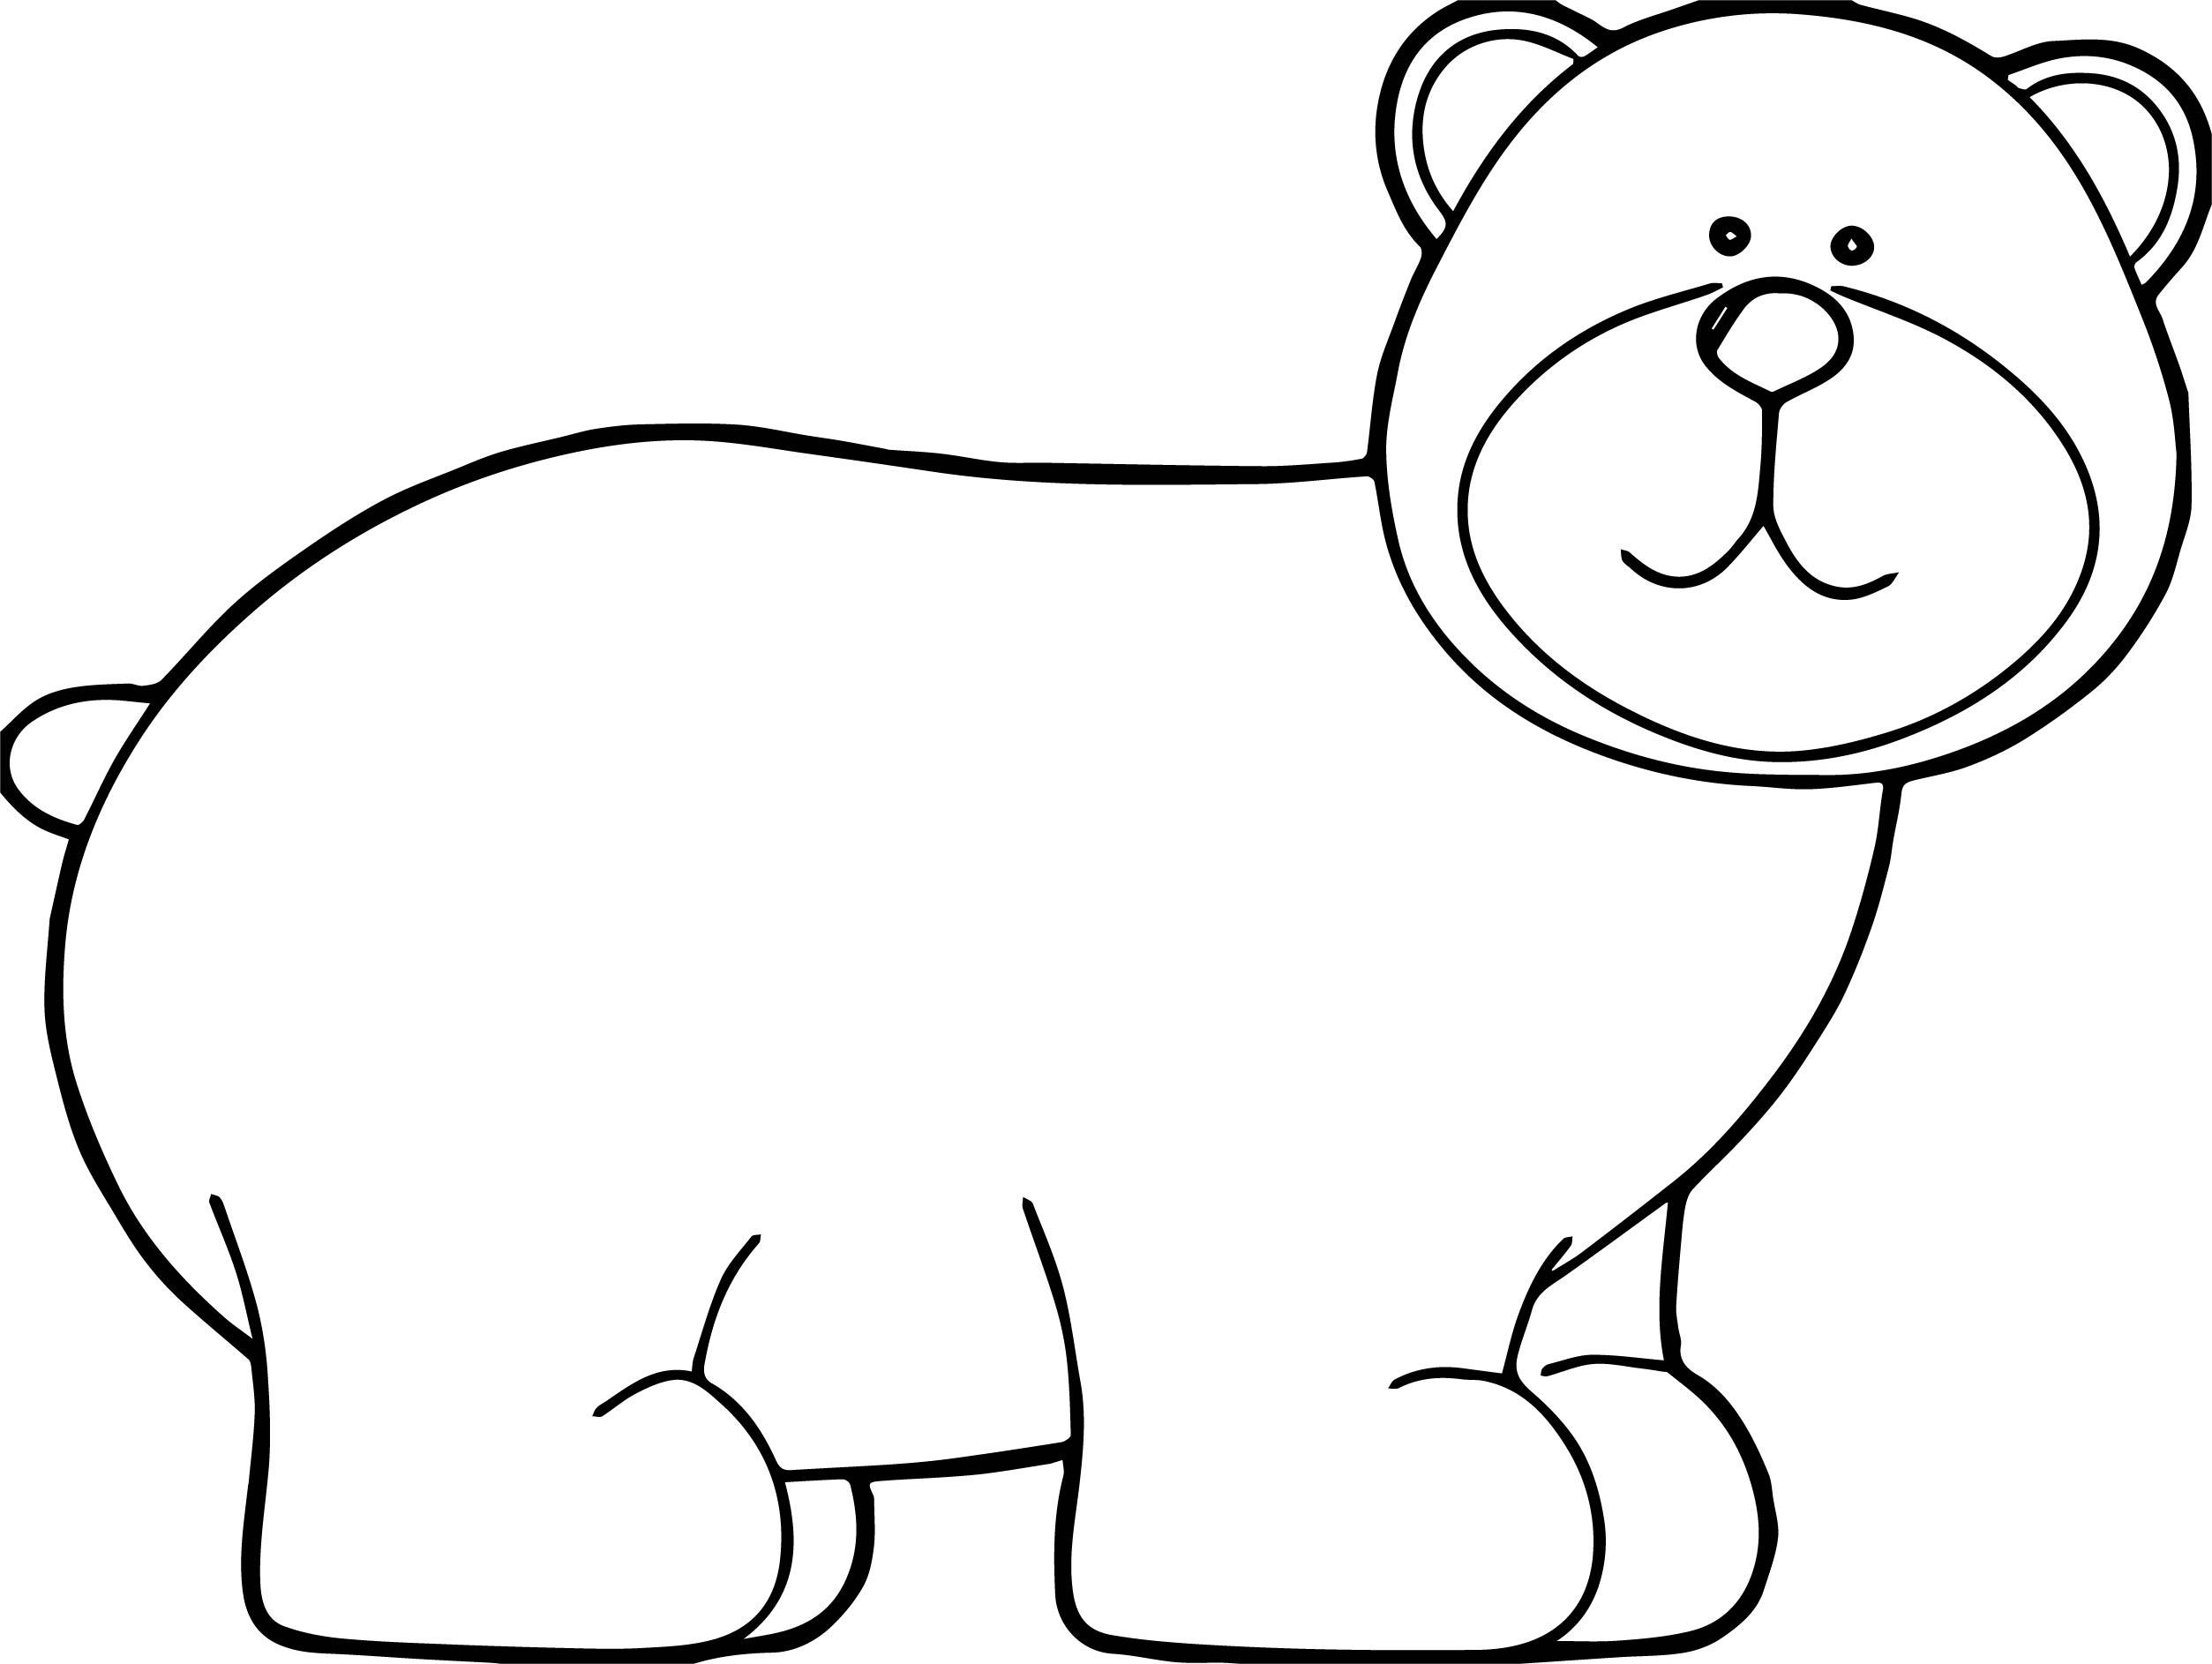 Said Bear Coloring Page